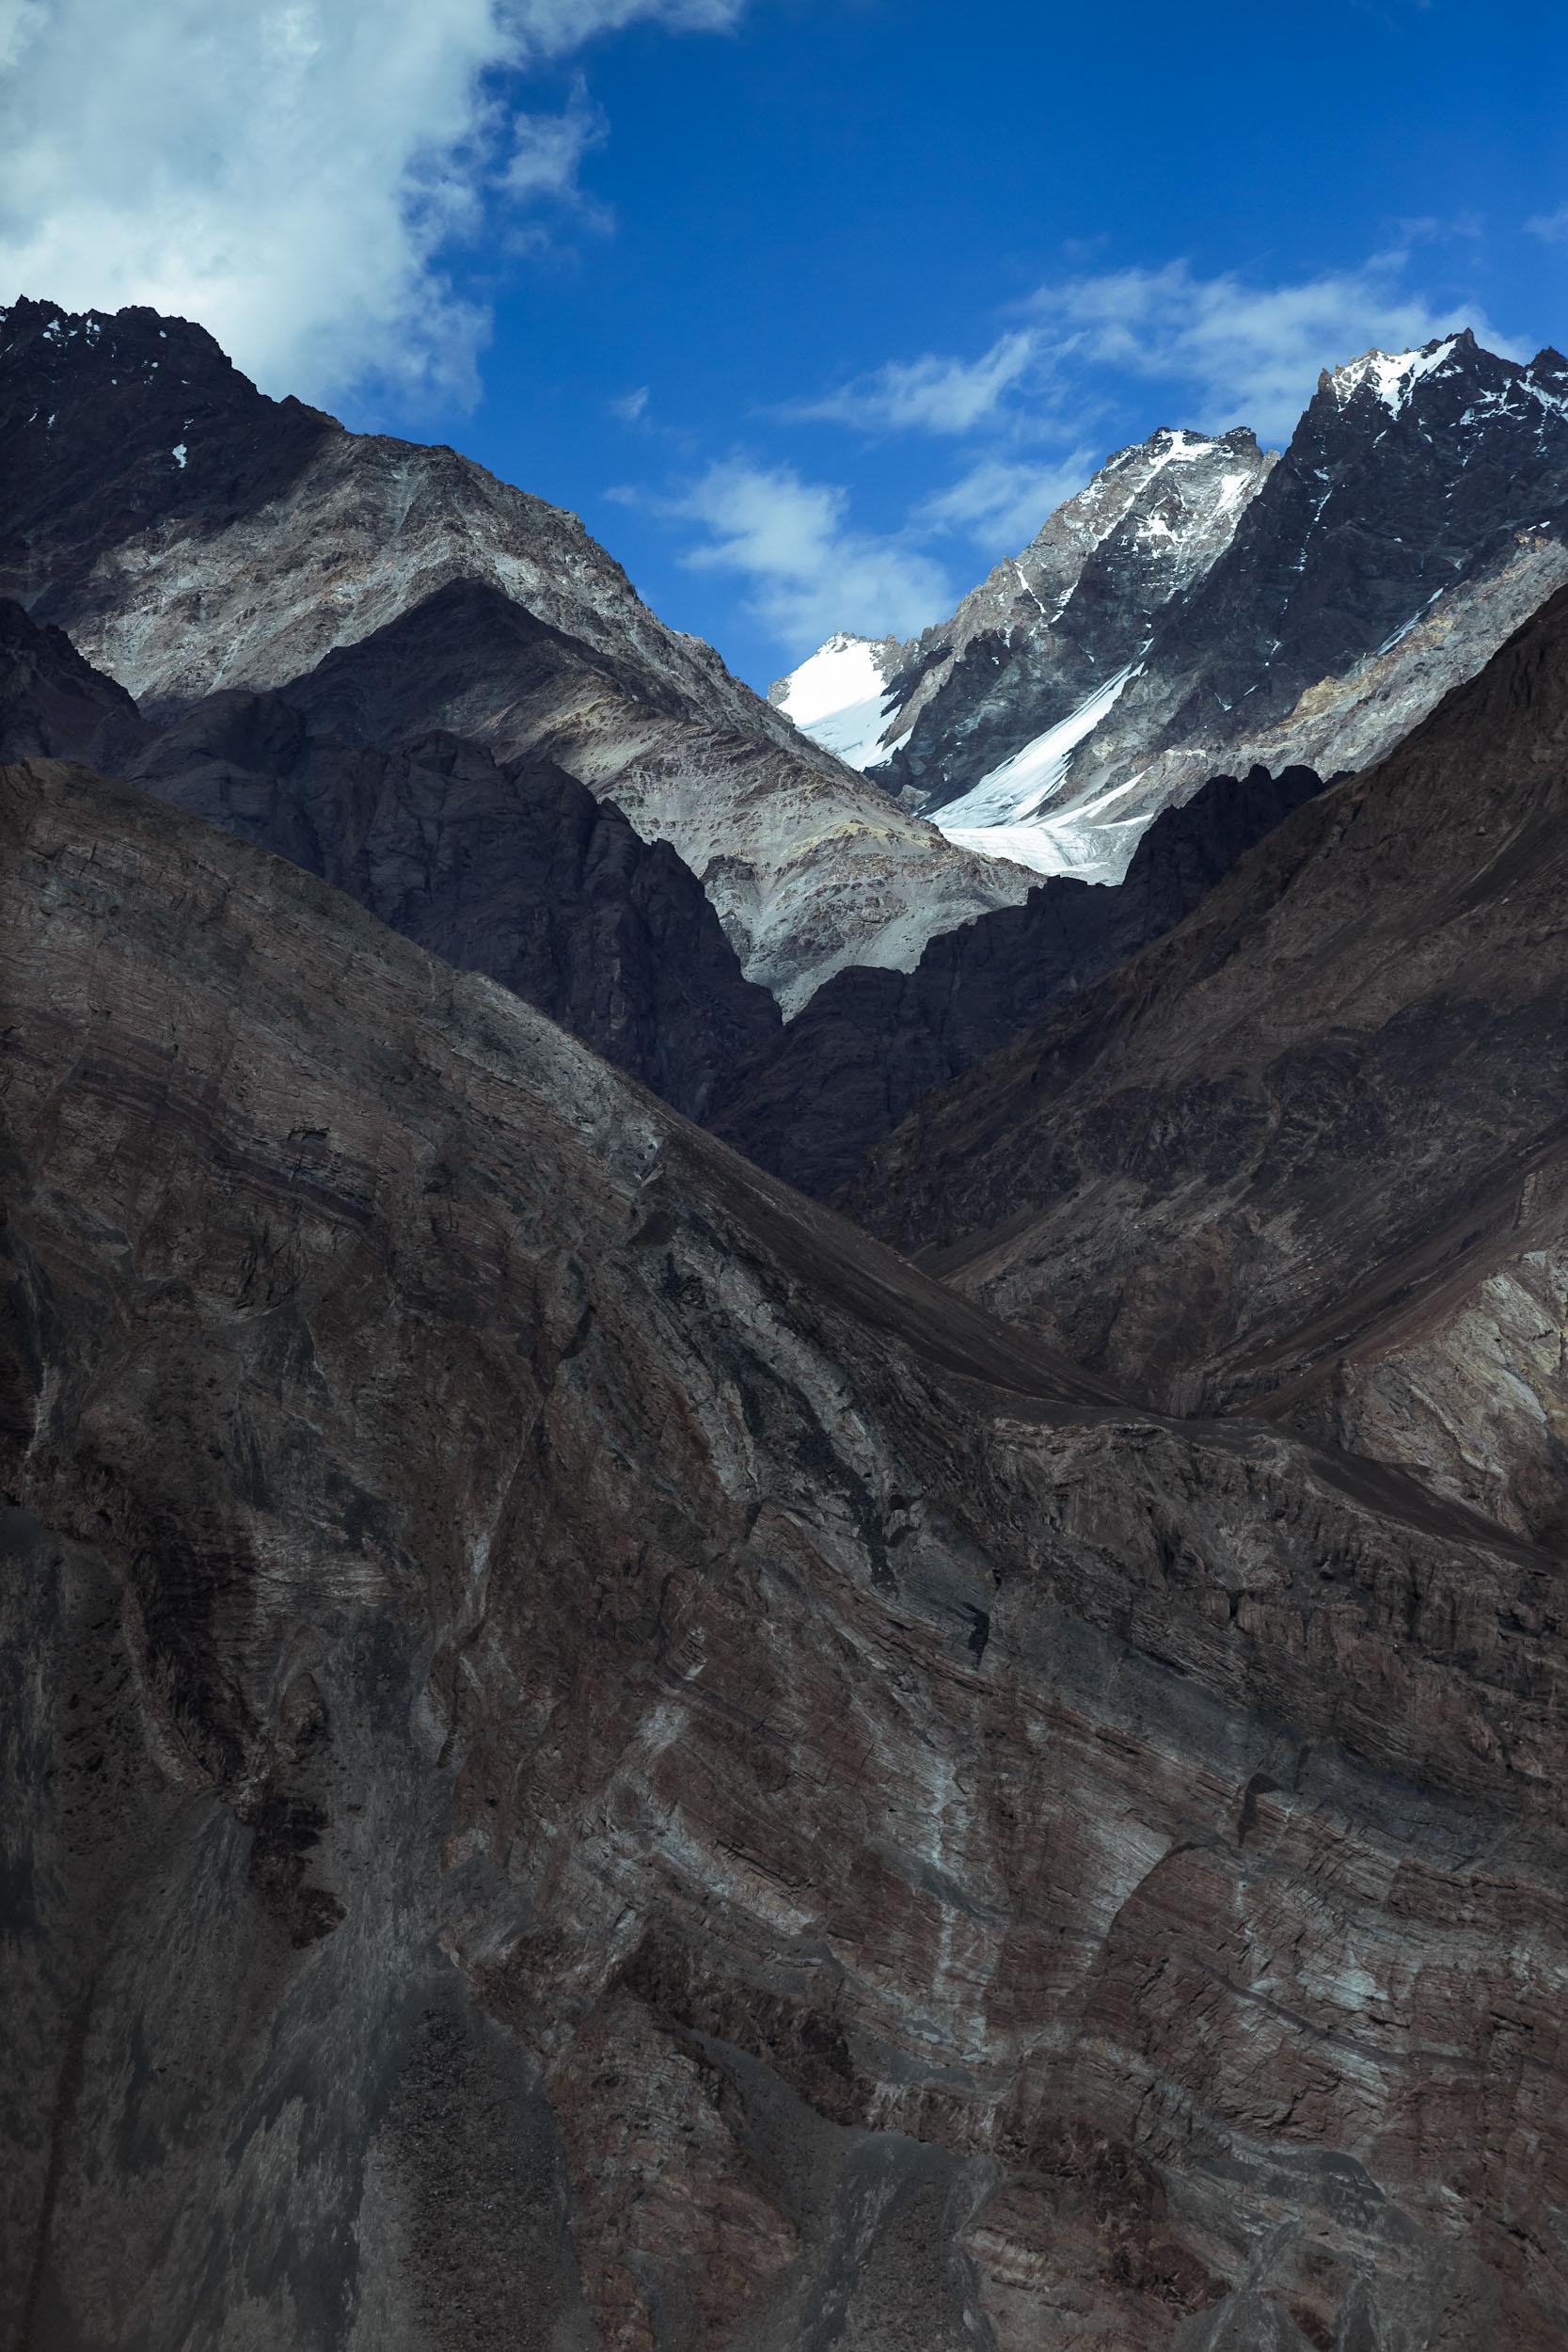 Sindhur_Photography_Travel_Landscape_Ladakh-15.JPG